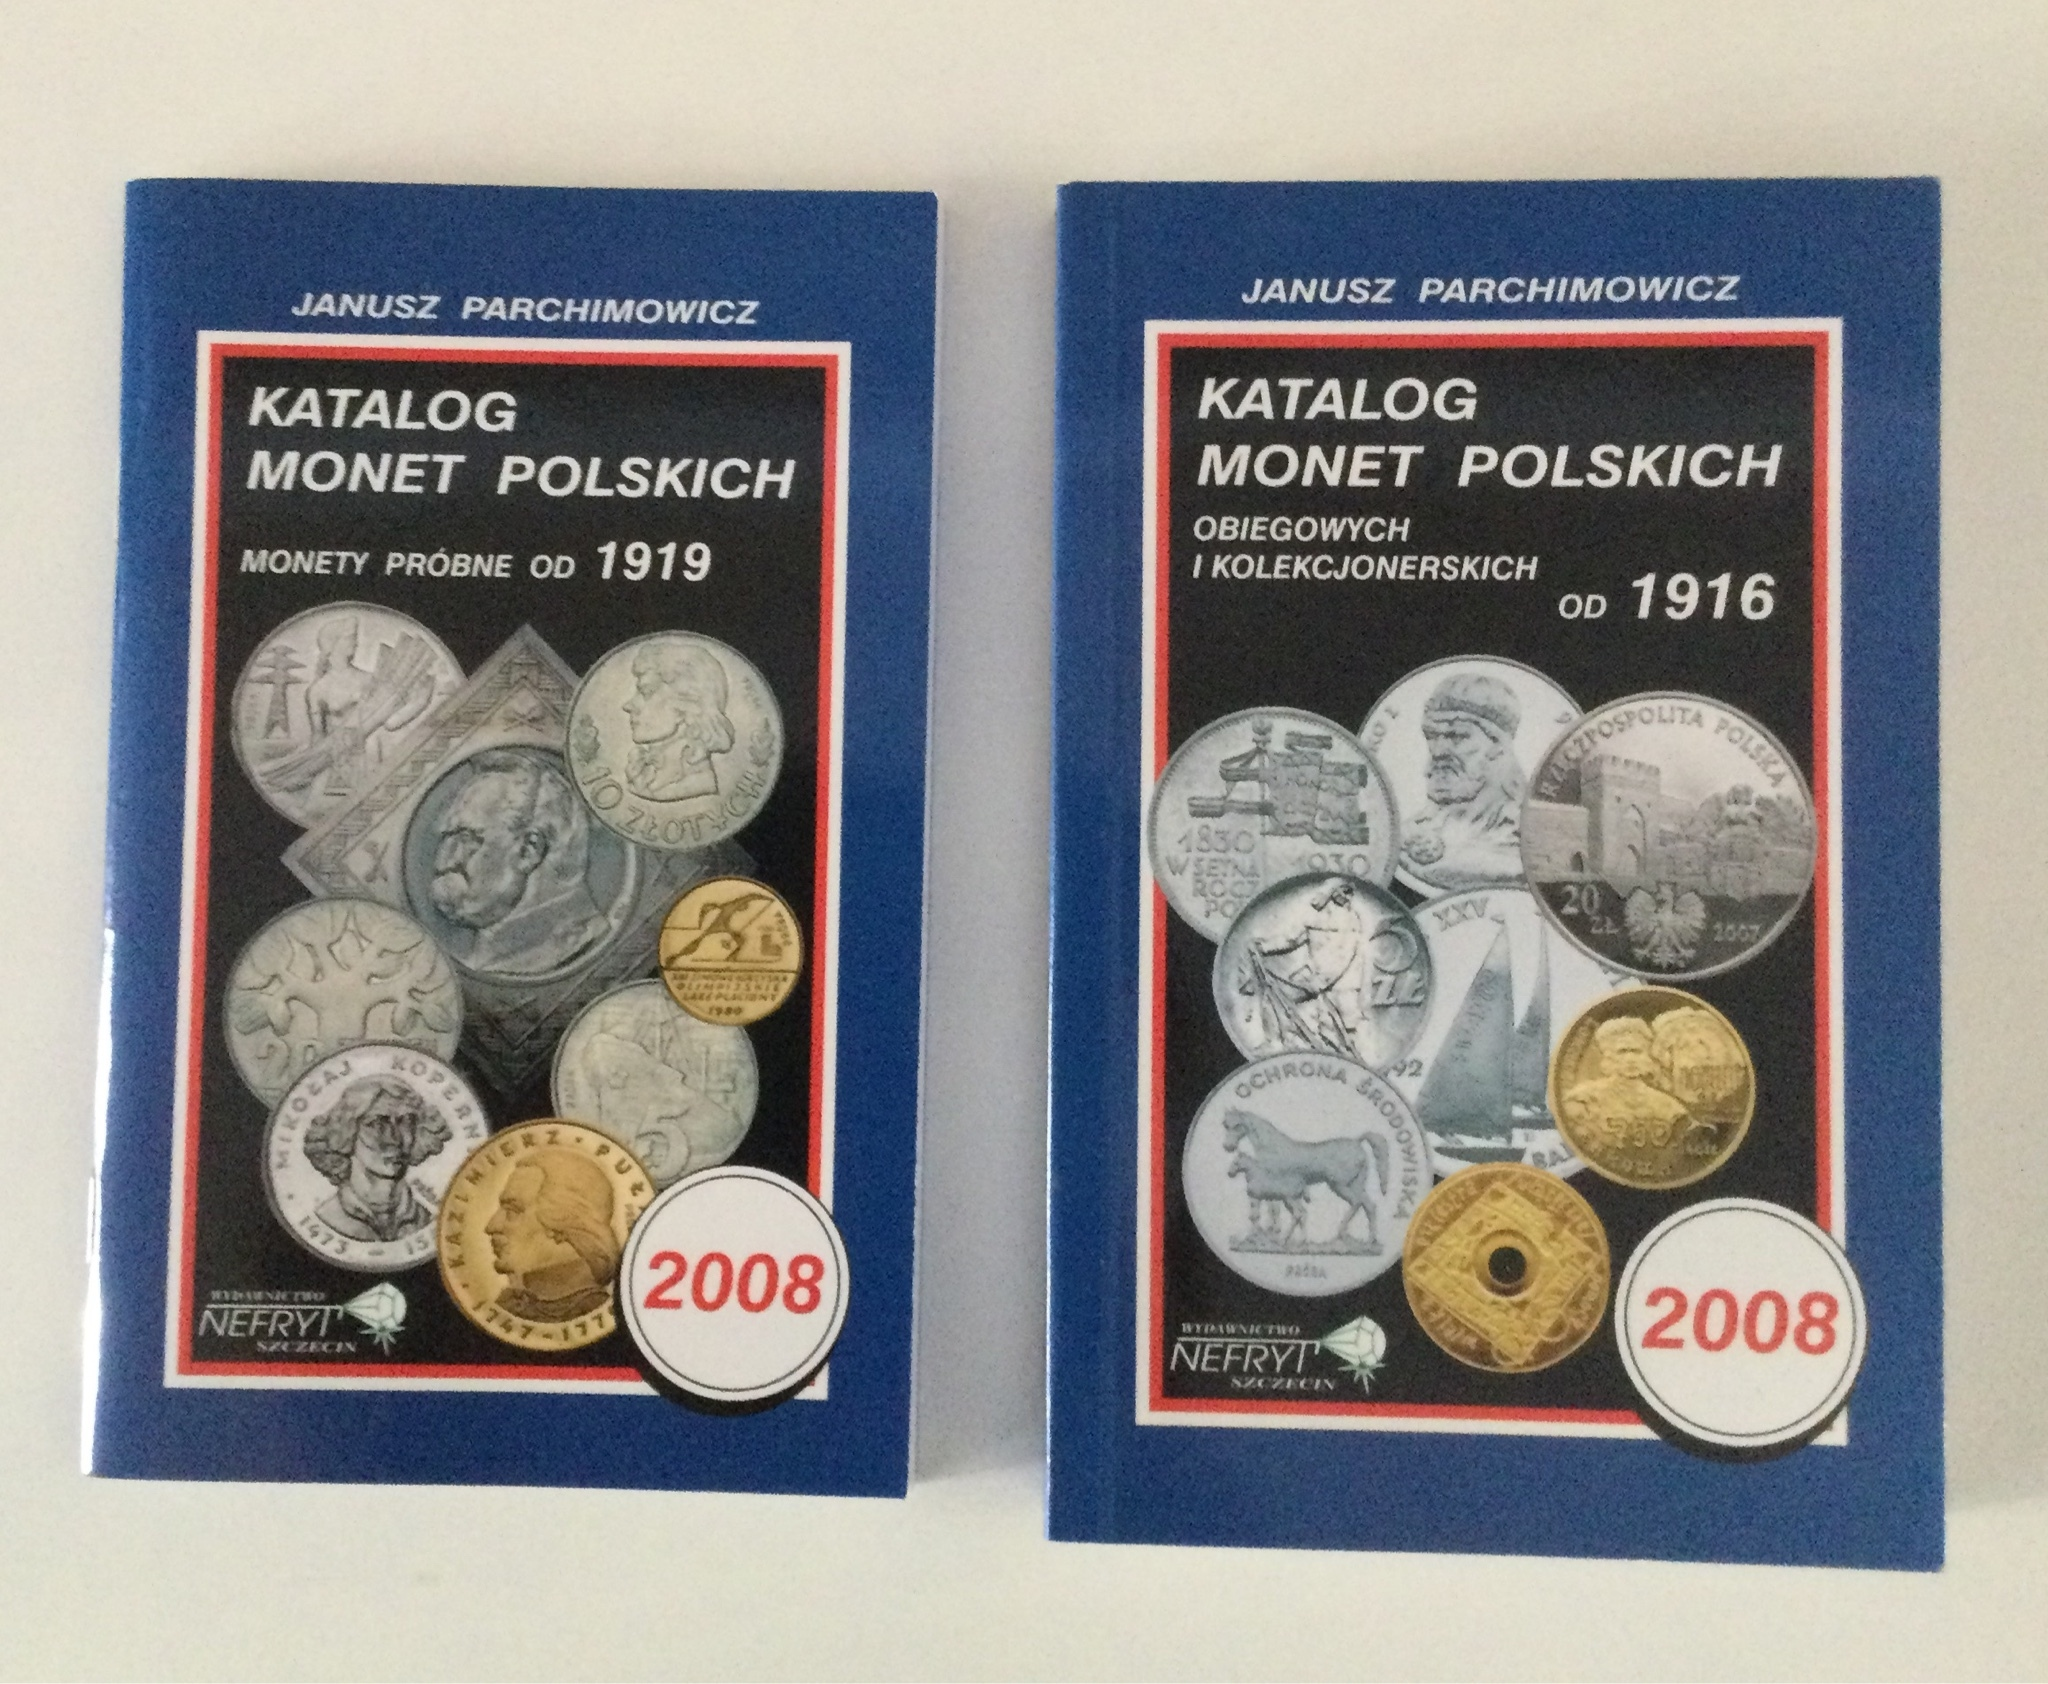 Katalog monet polskich - próbne kolekcjonerskie